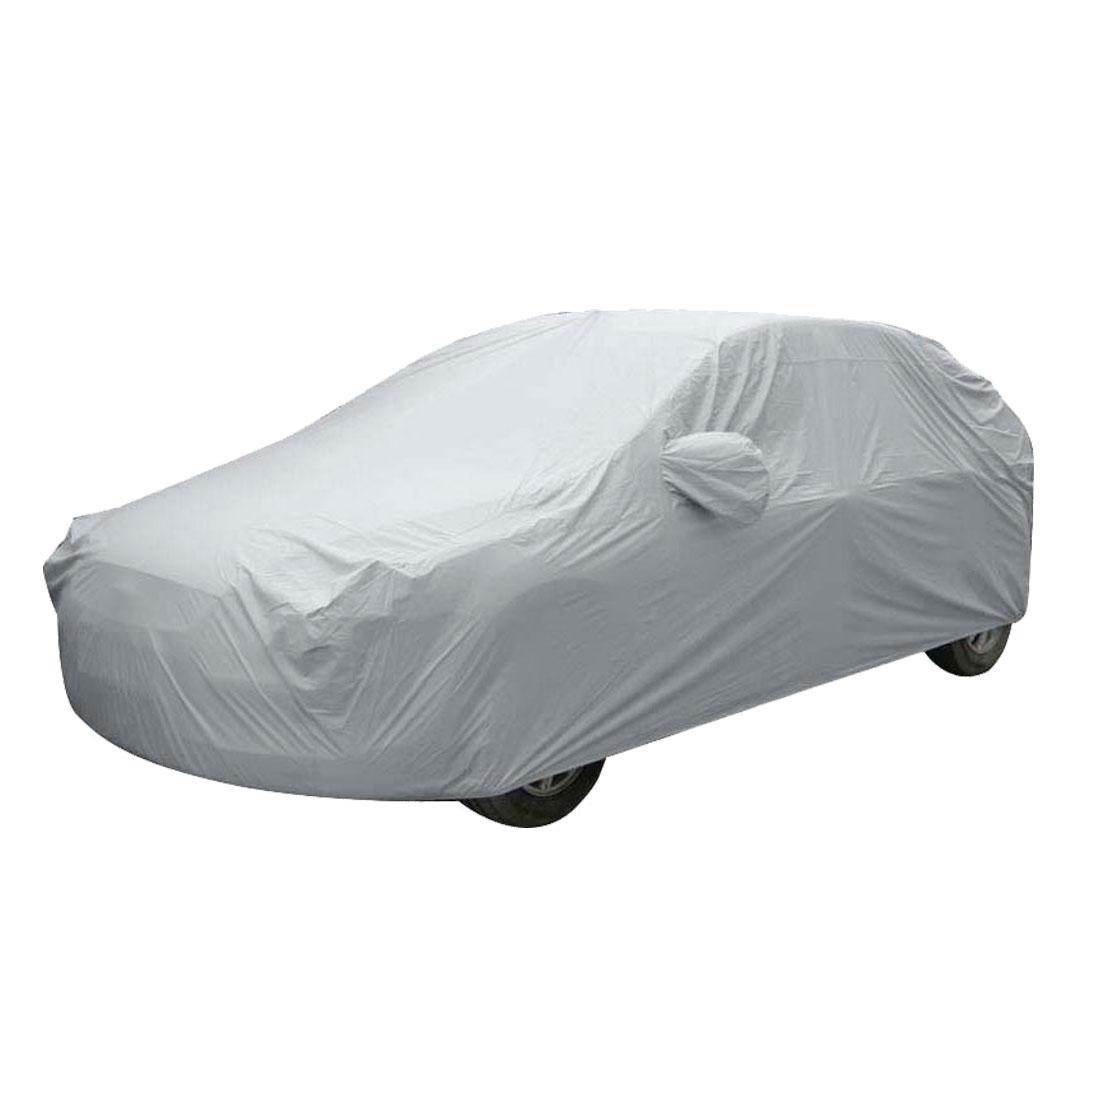 Anti Dust Water Proof Sedan Car Cover Silver Tone for Volkswagen Jetta Bora Golf